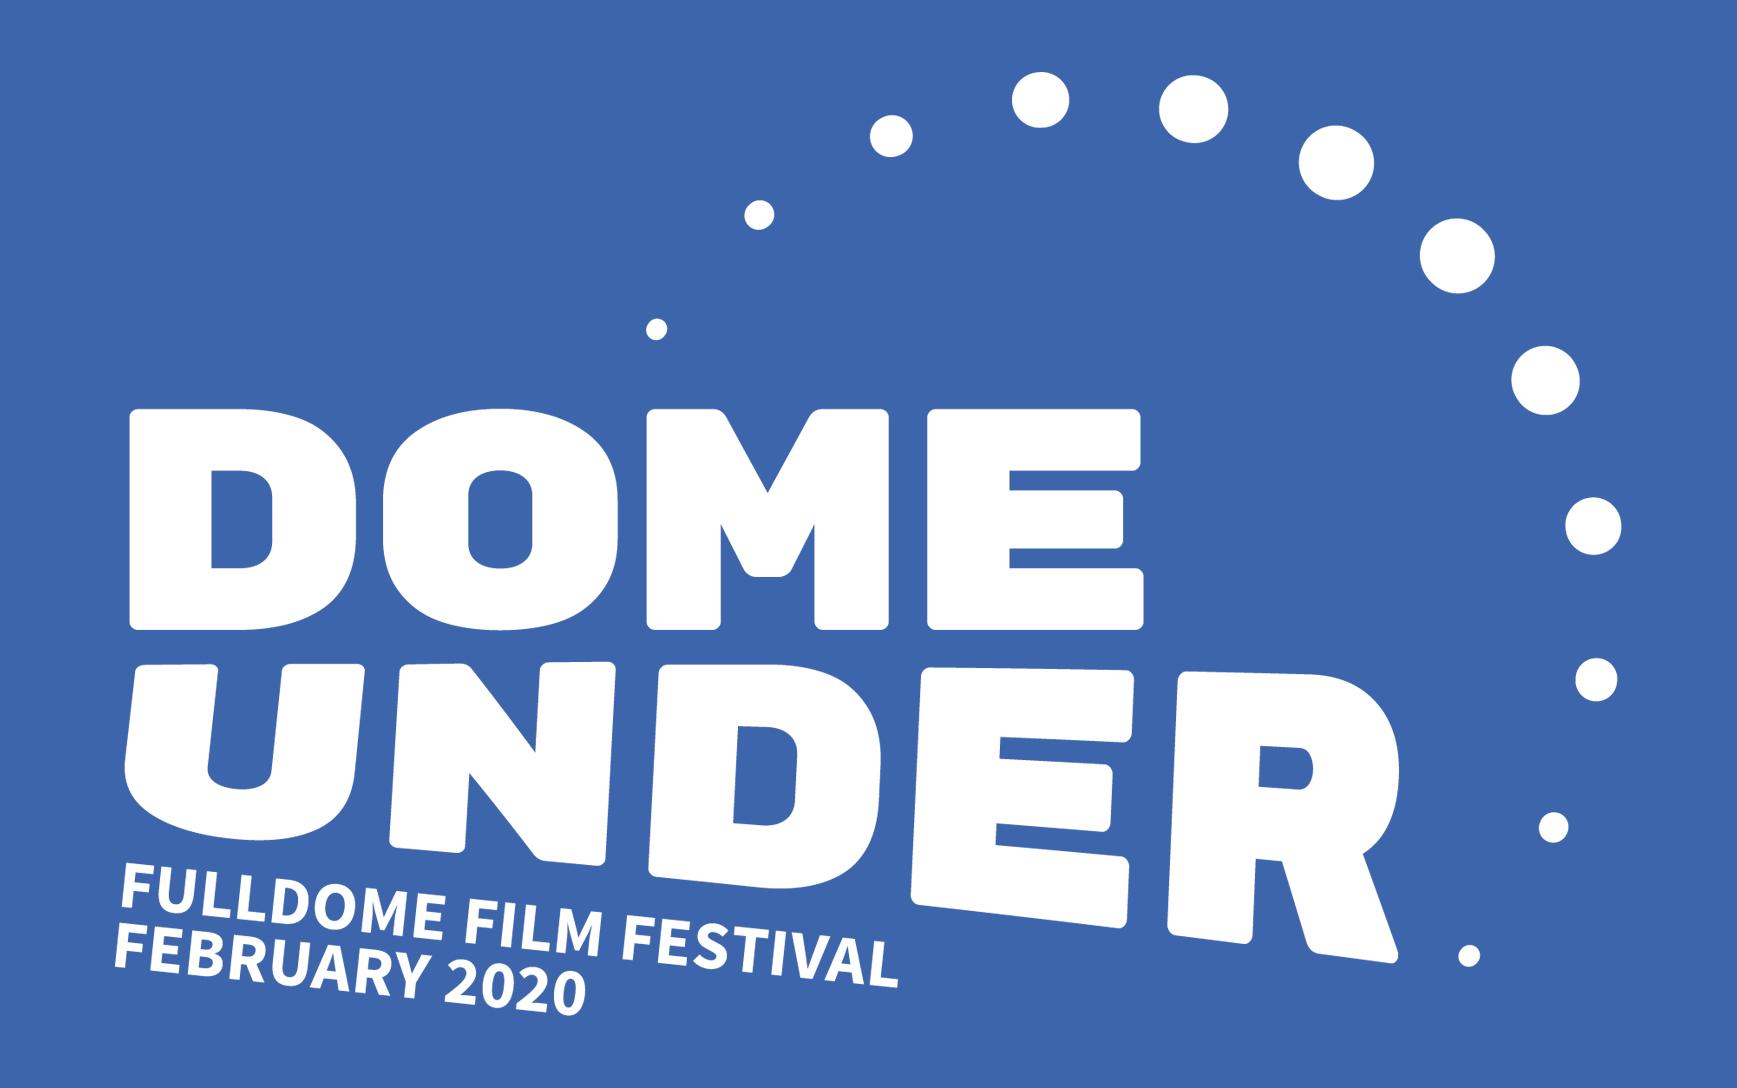 Dome Under Festival Logo